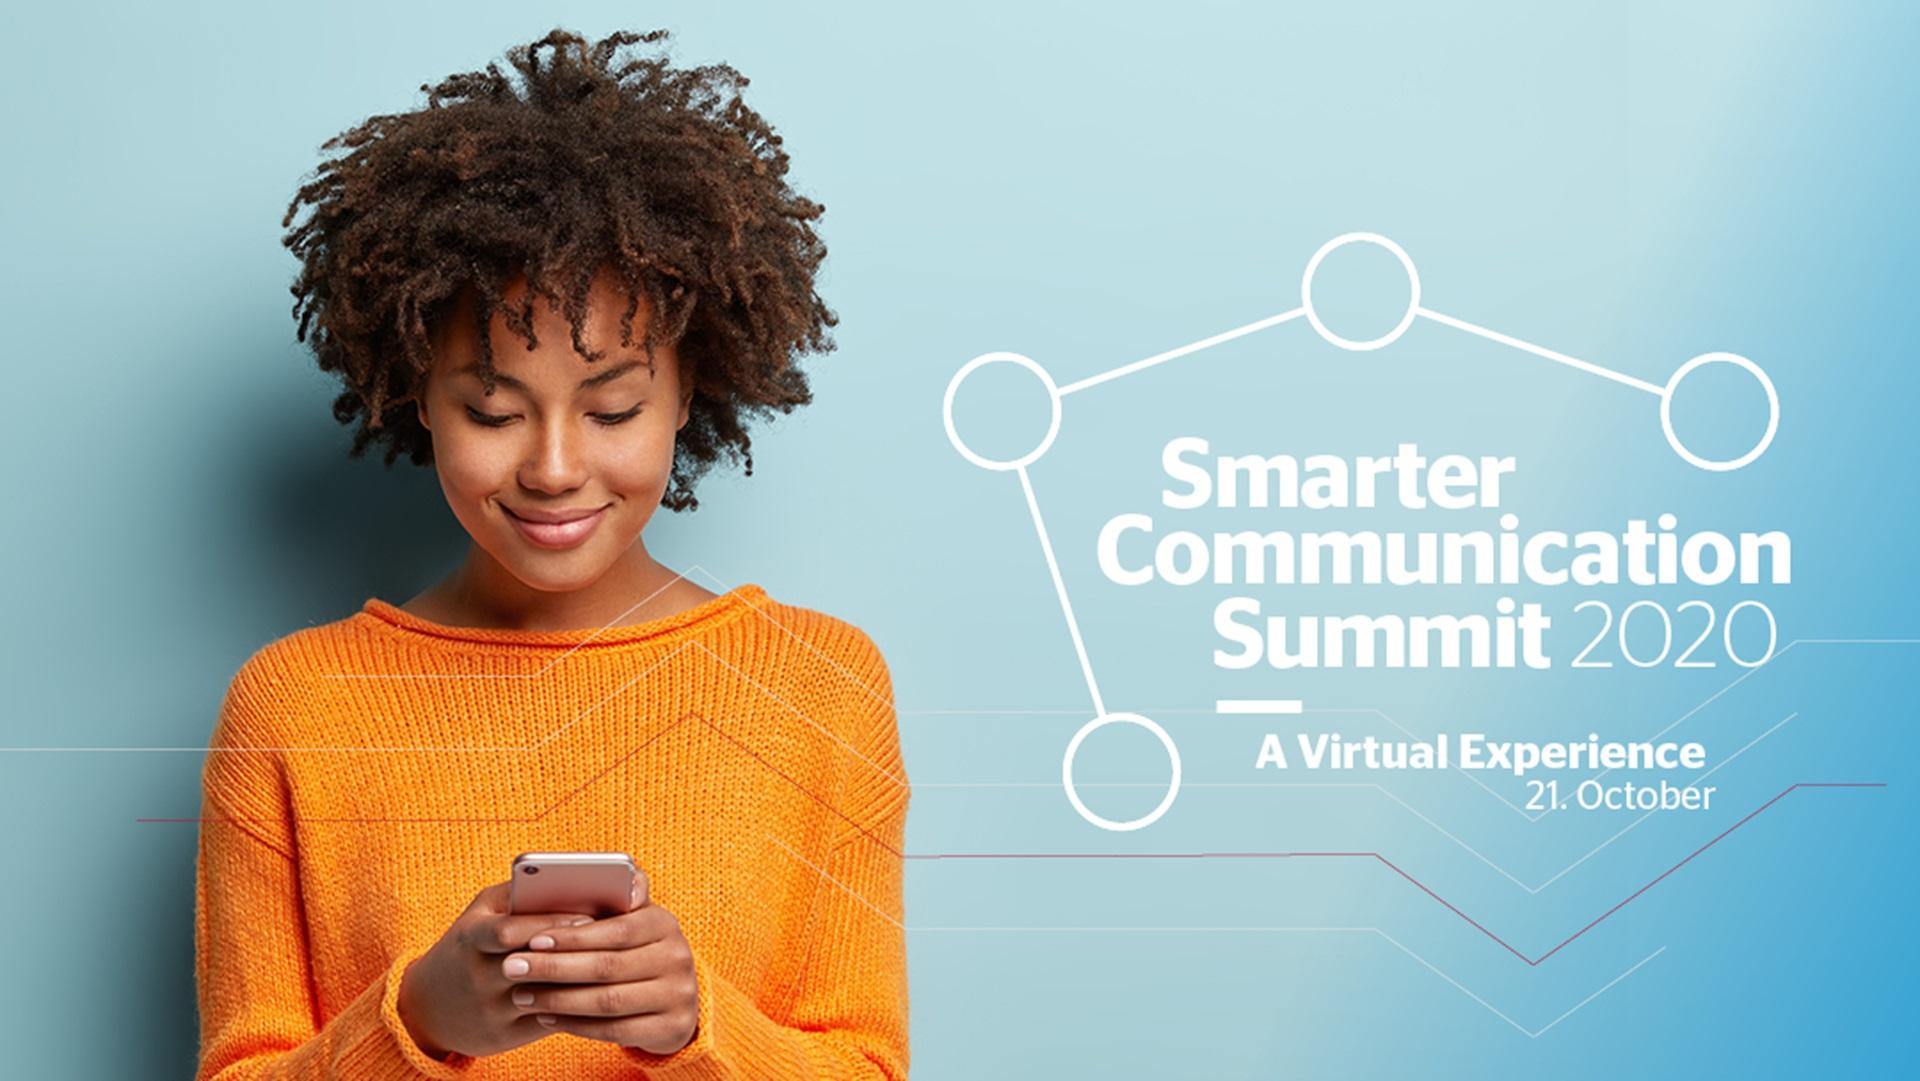 Summit-2020_16-9.jpg